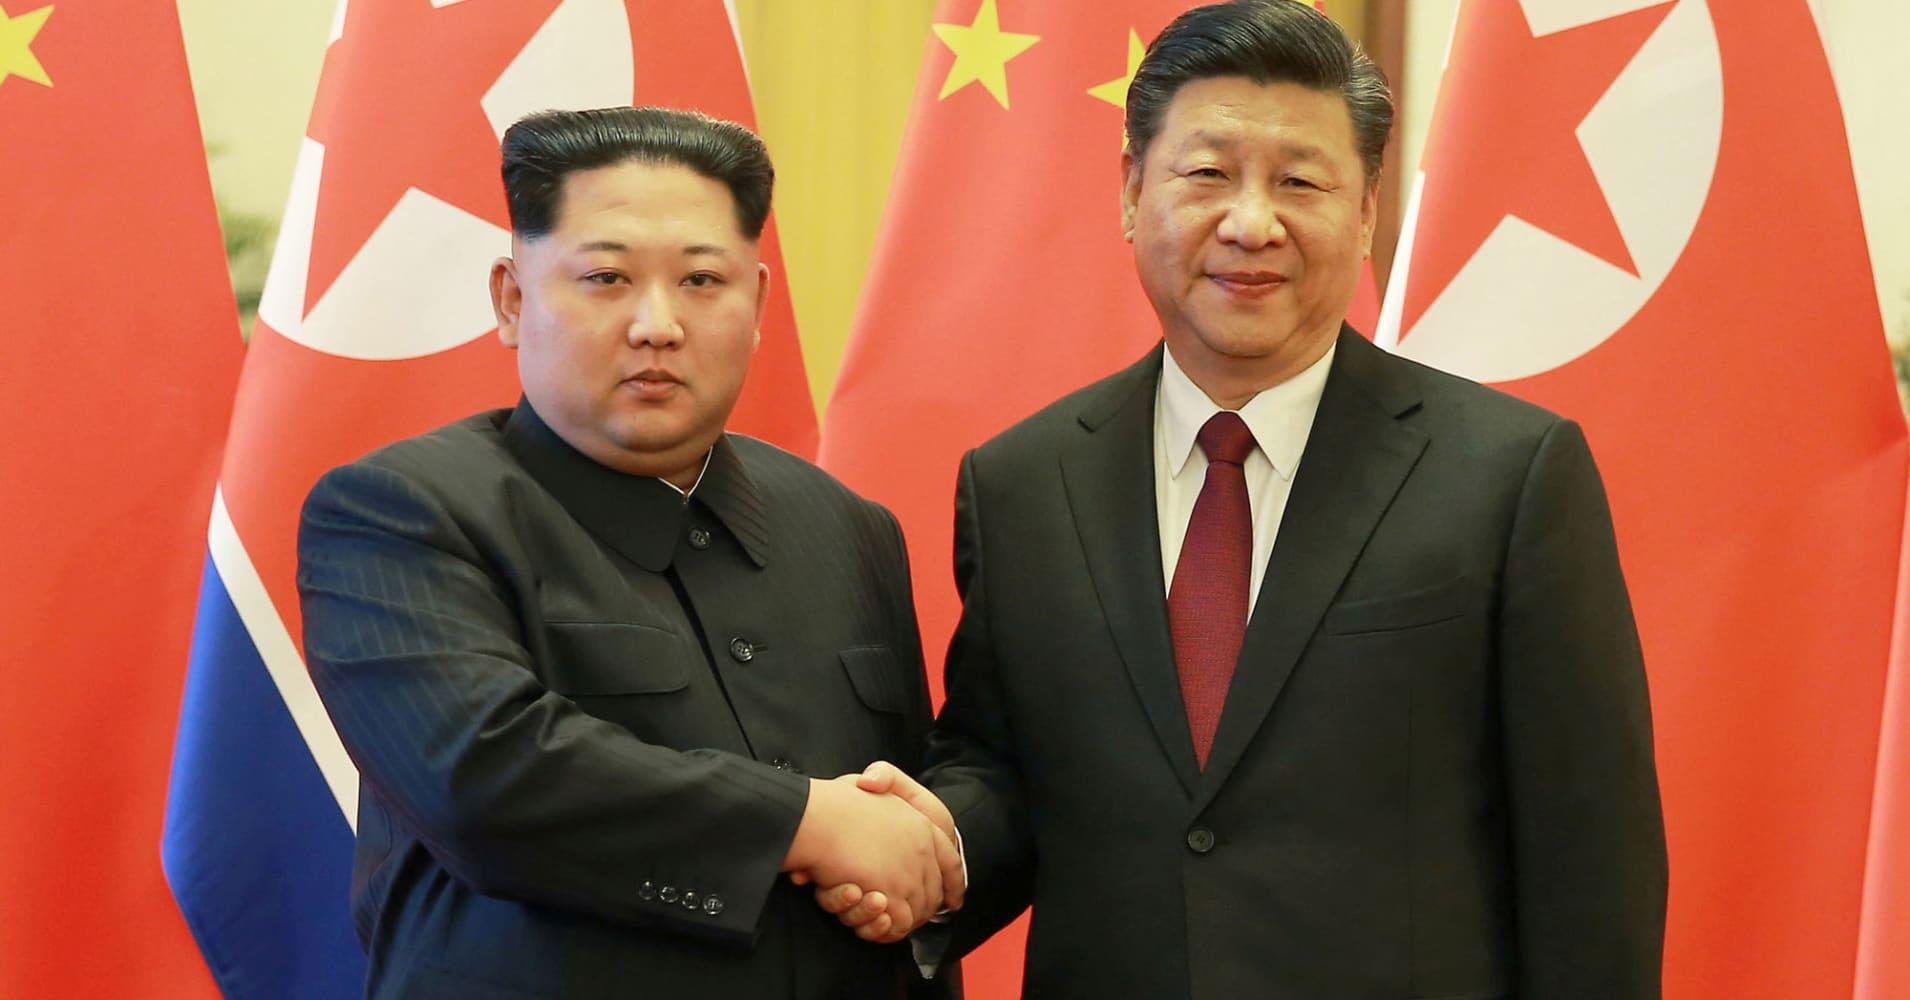 North Korea's Kim Jong Un visits China, state media reports